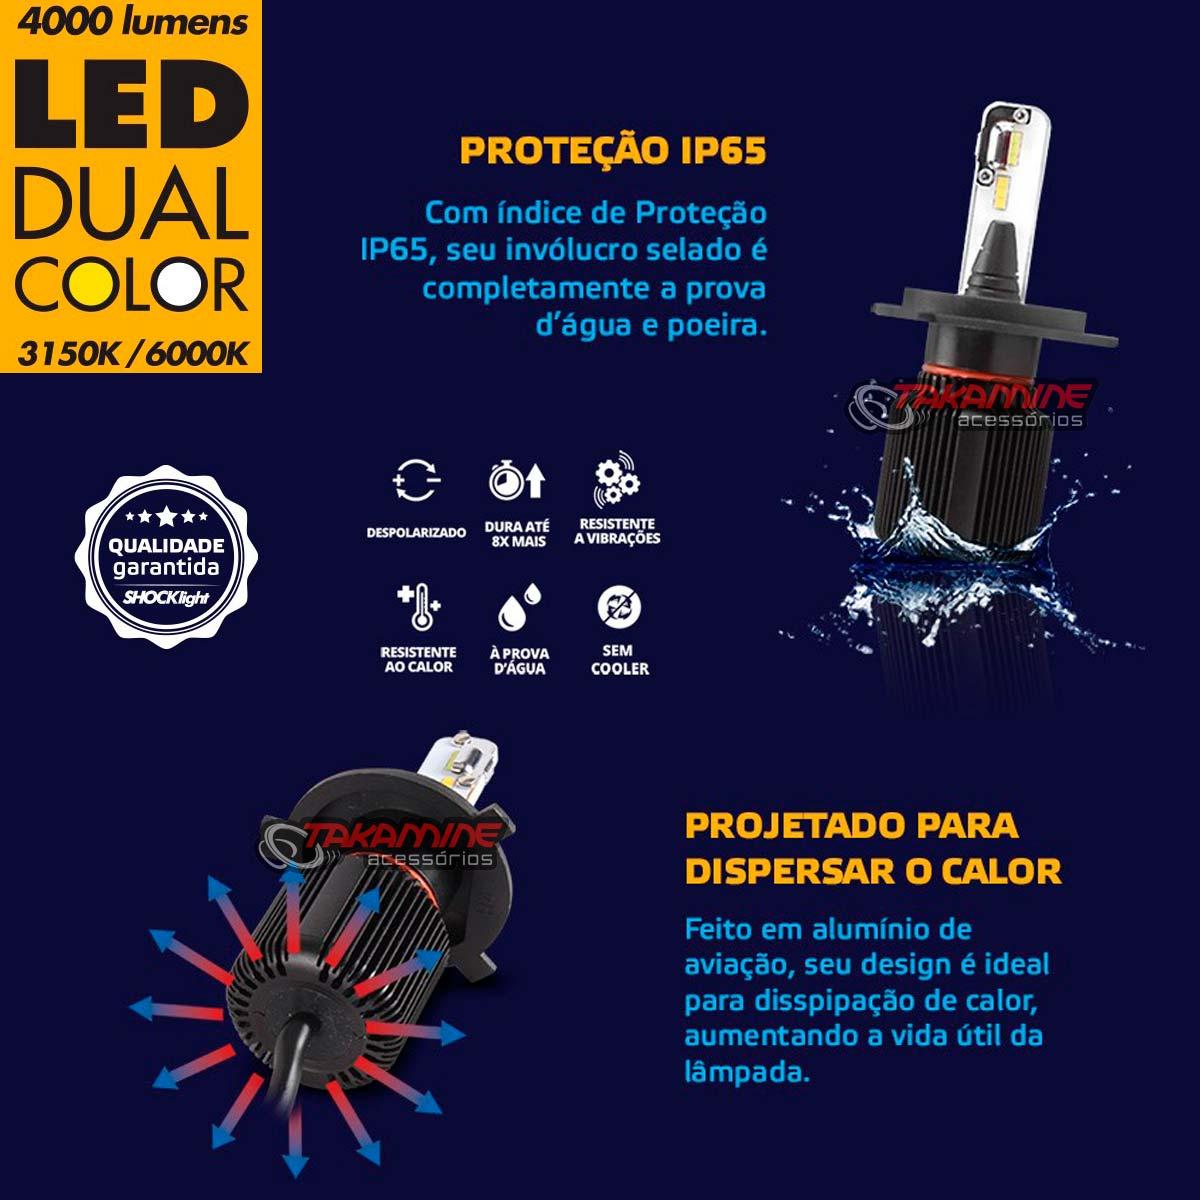 Kit de lâmpadas LED Dual Color Headlight Shocklight  tipo xenon H3 25W ilumina branco e amarelo